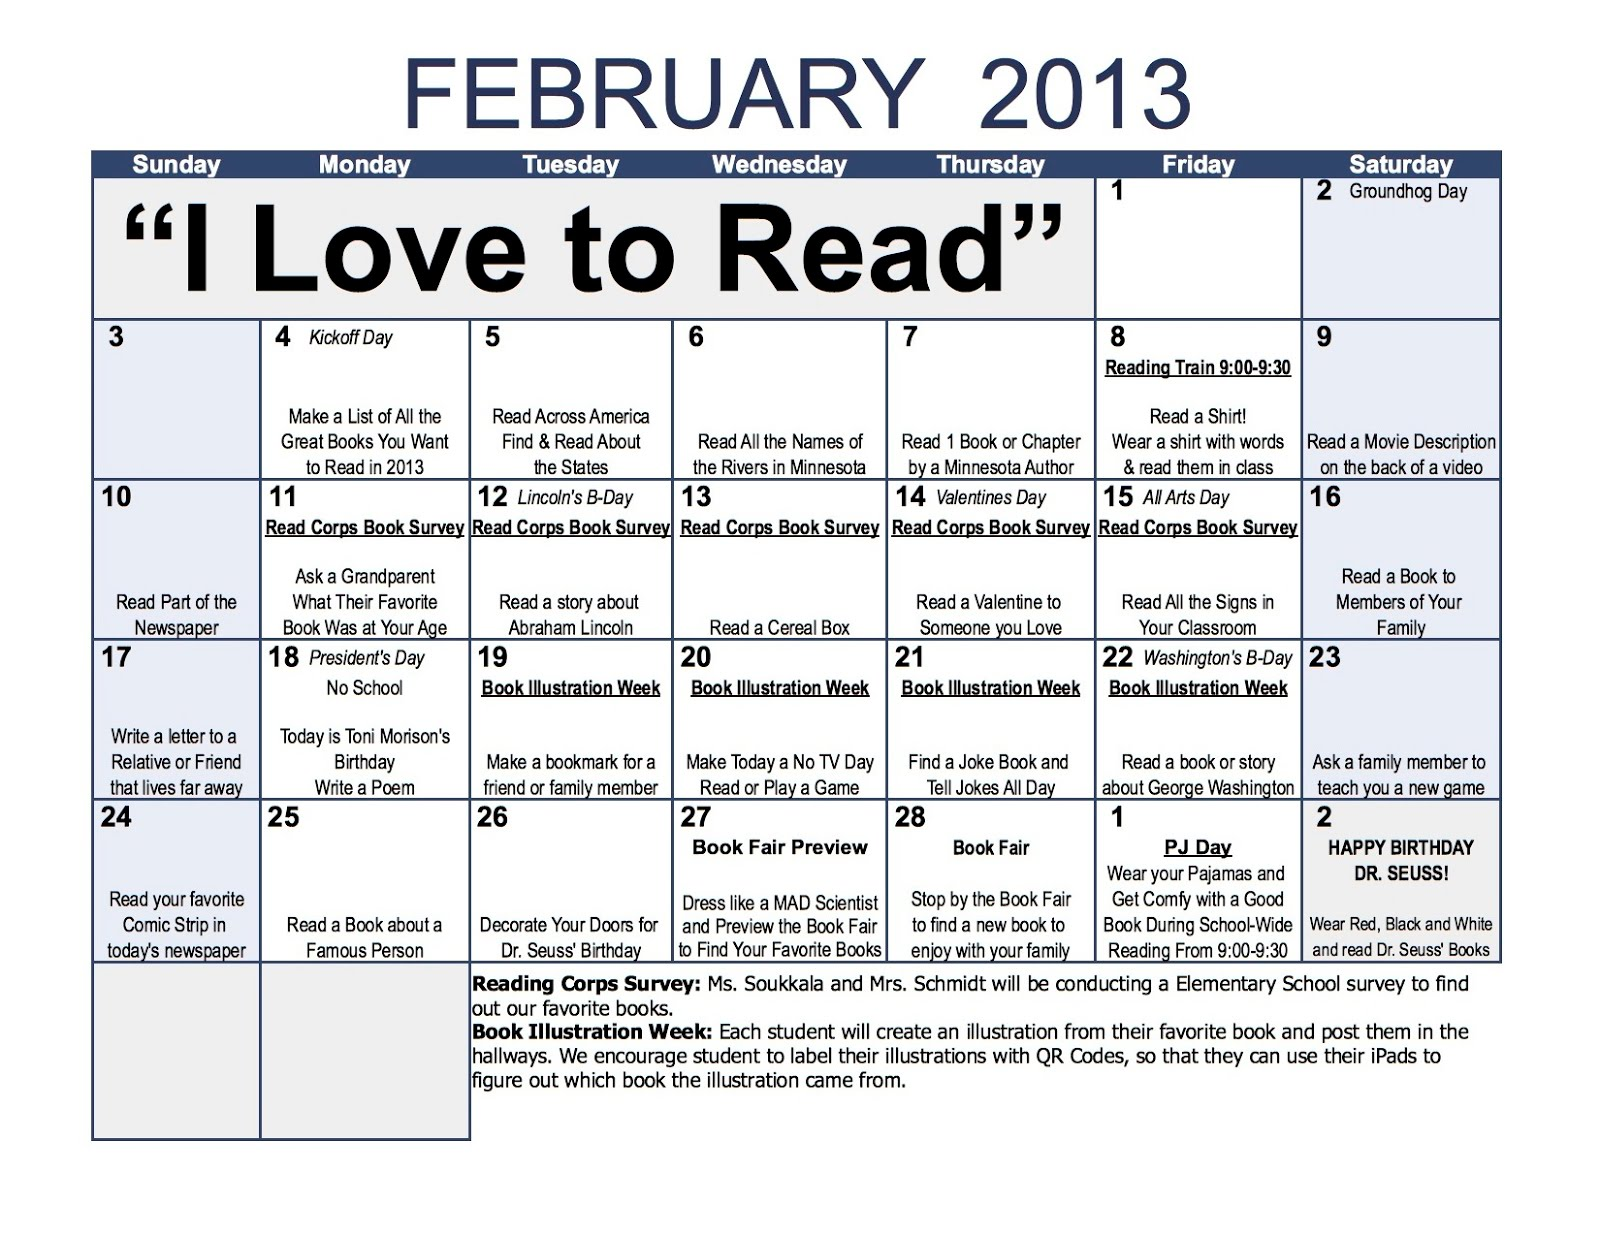 Monthly Reading Calendar : Evan lembke edtech quot i love to read month calendar